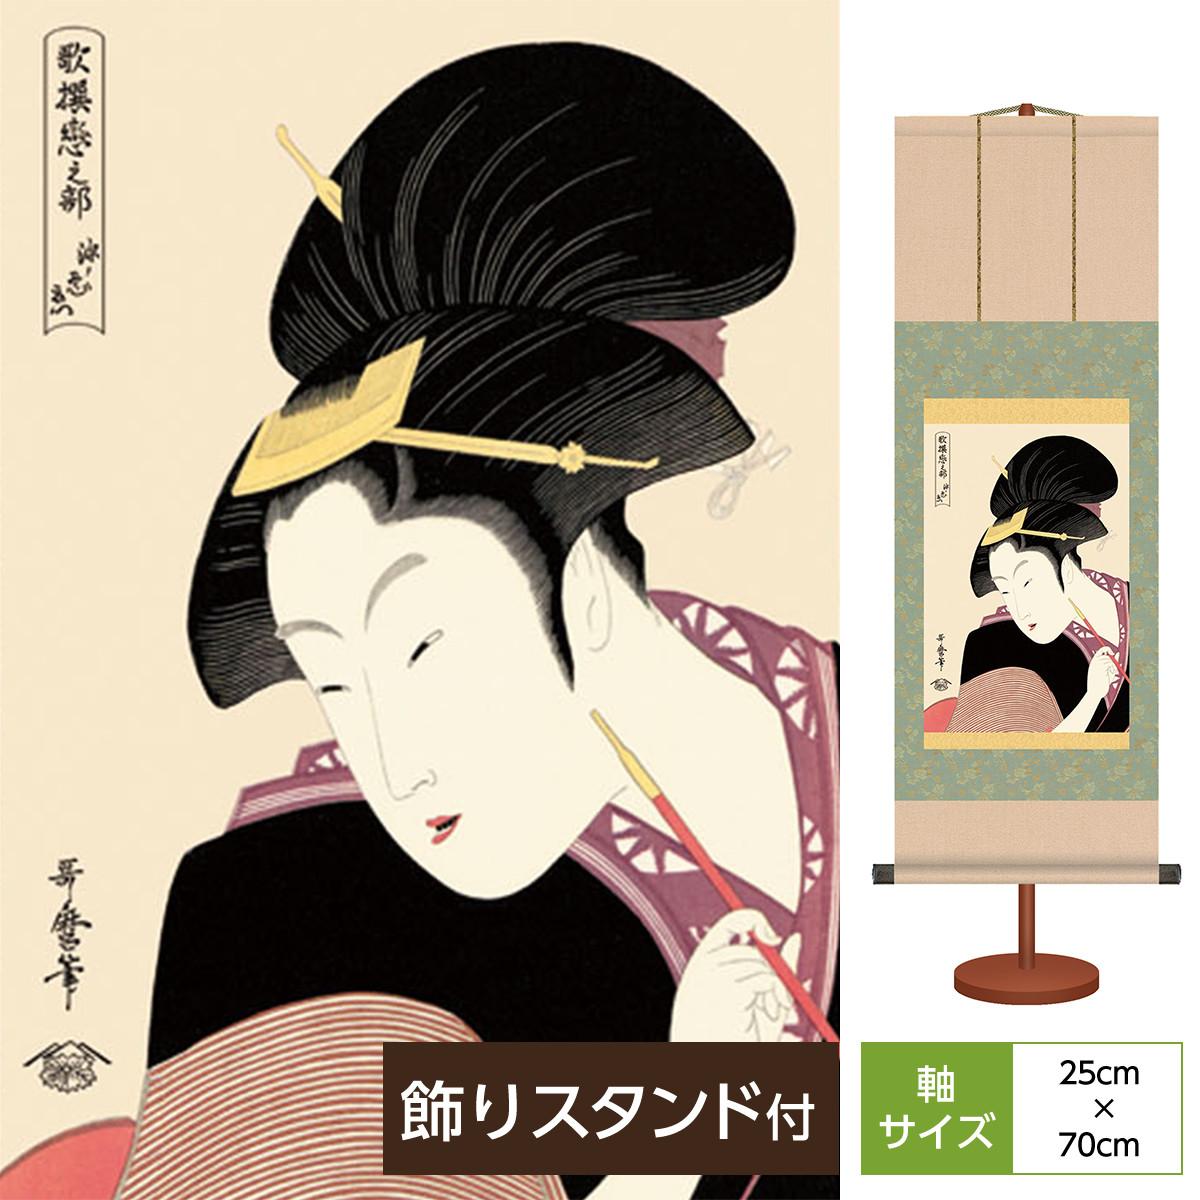 楽天市場 浮世絵 ミニ掛軸 美人画 深く忍恋 喜多川歌麿 サイズ 幅